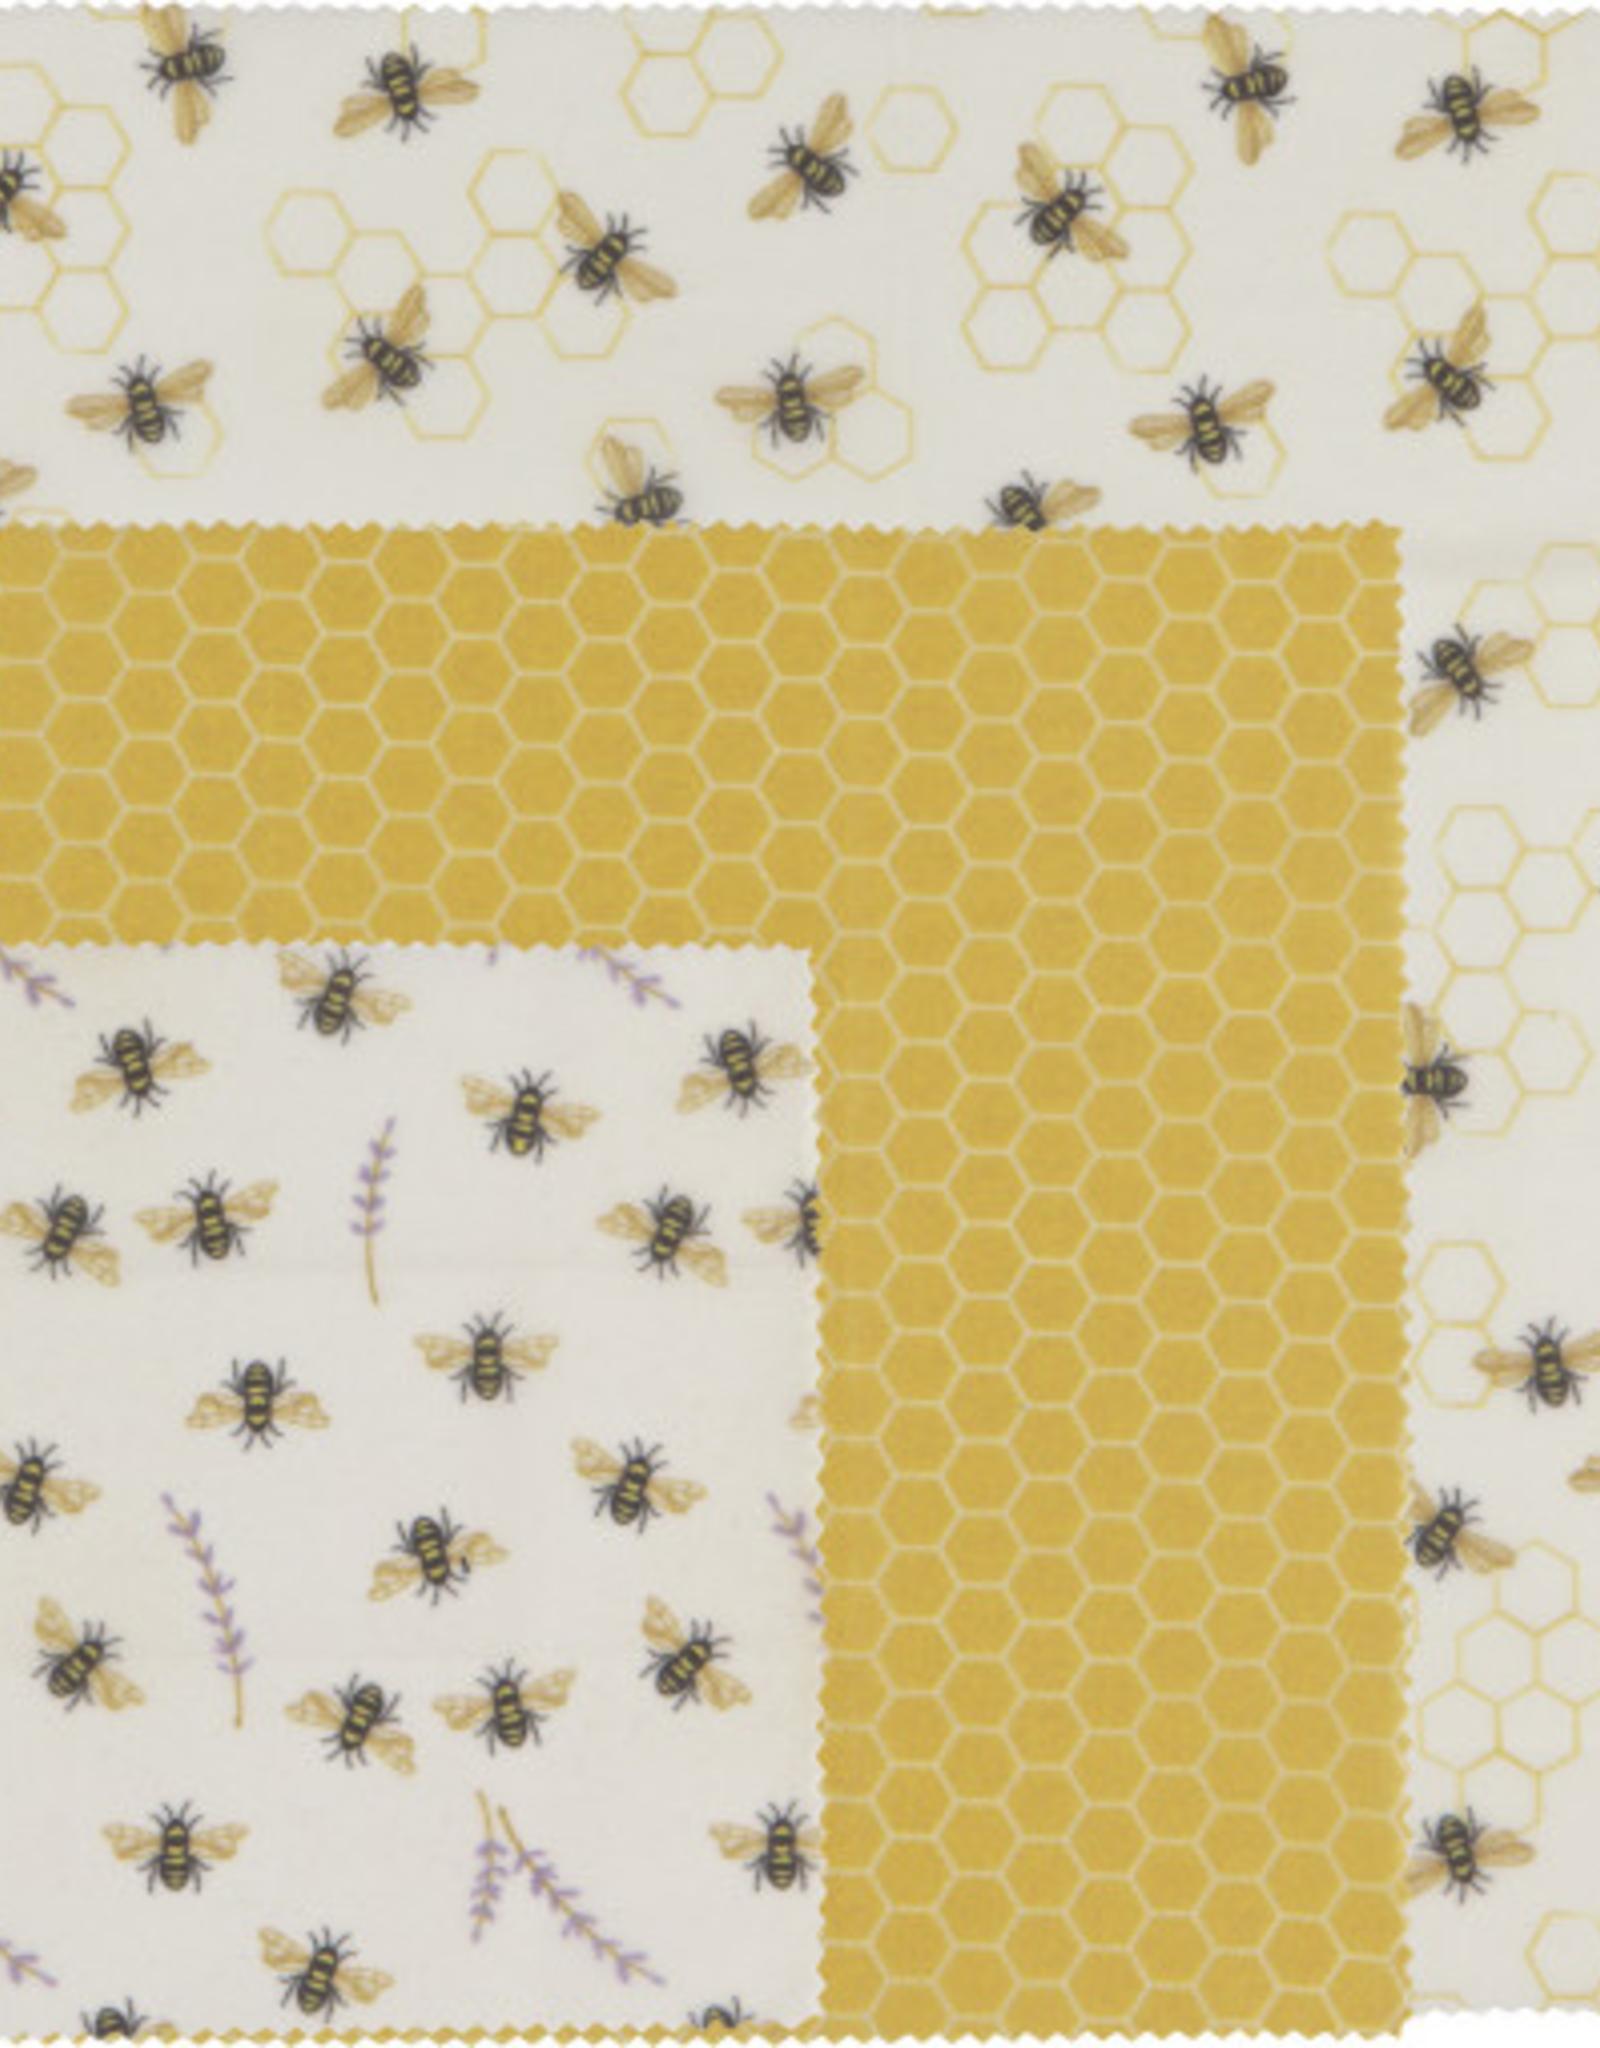 Danica Danica Beeswax Wrap-Bees Set 3